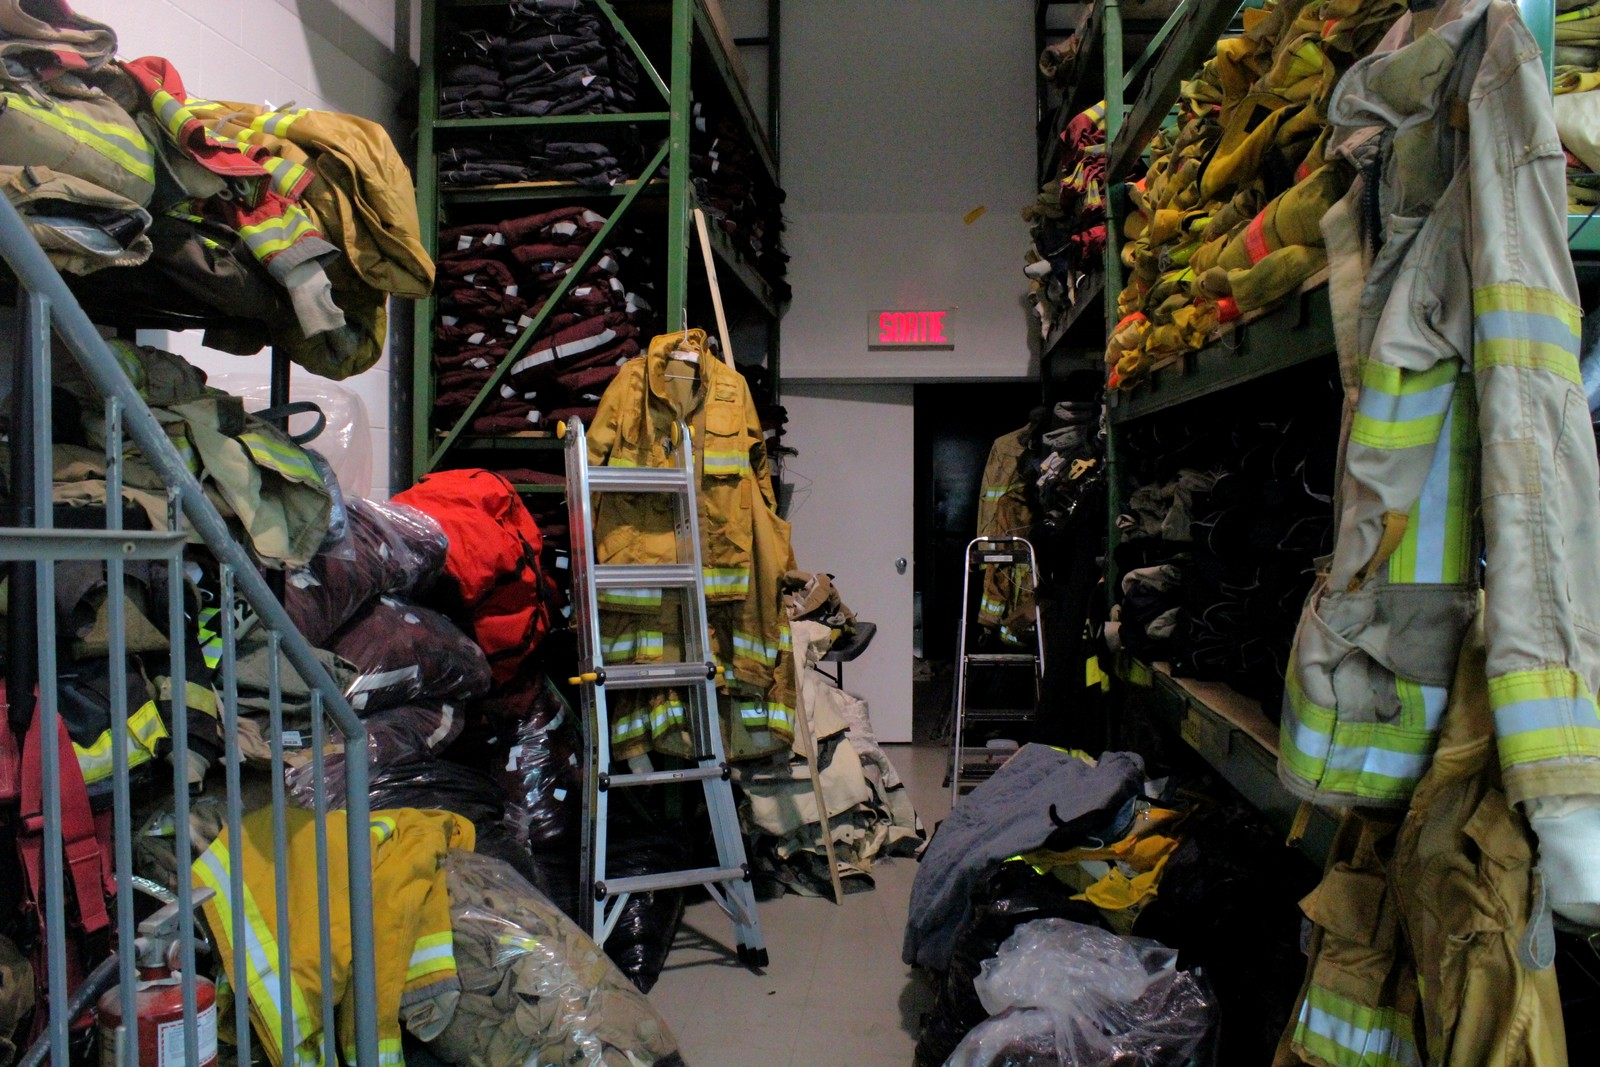 L'entreprise Firebags MTL compte cinq employés. ©AL